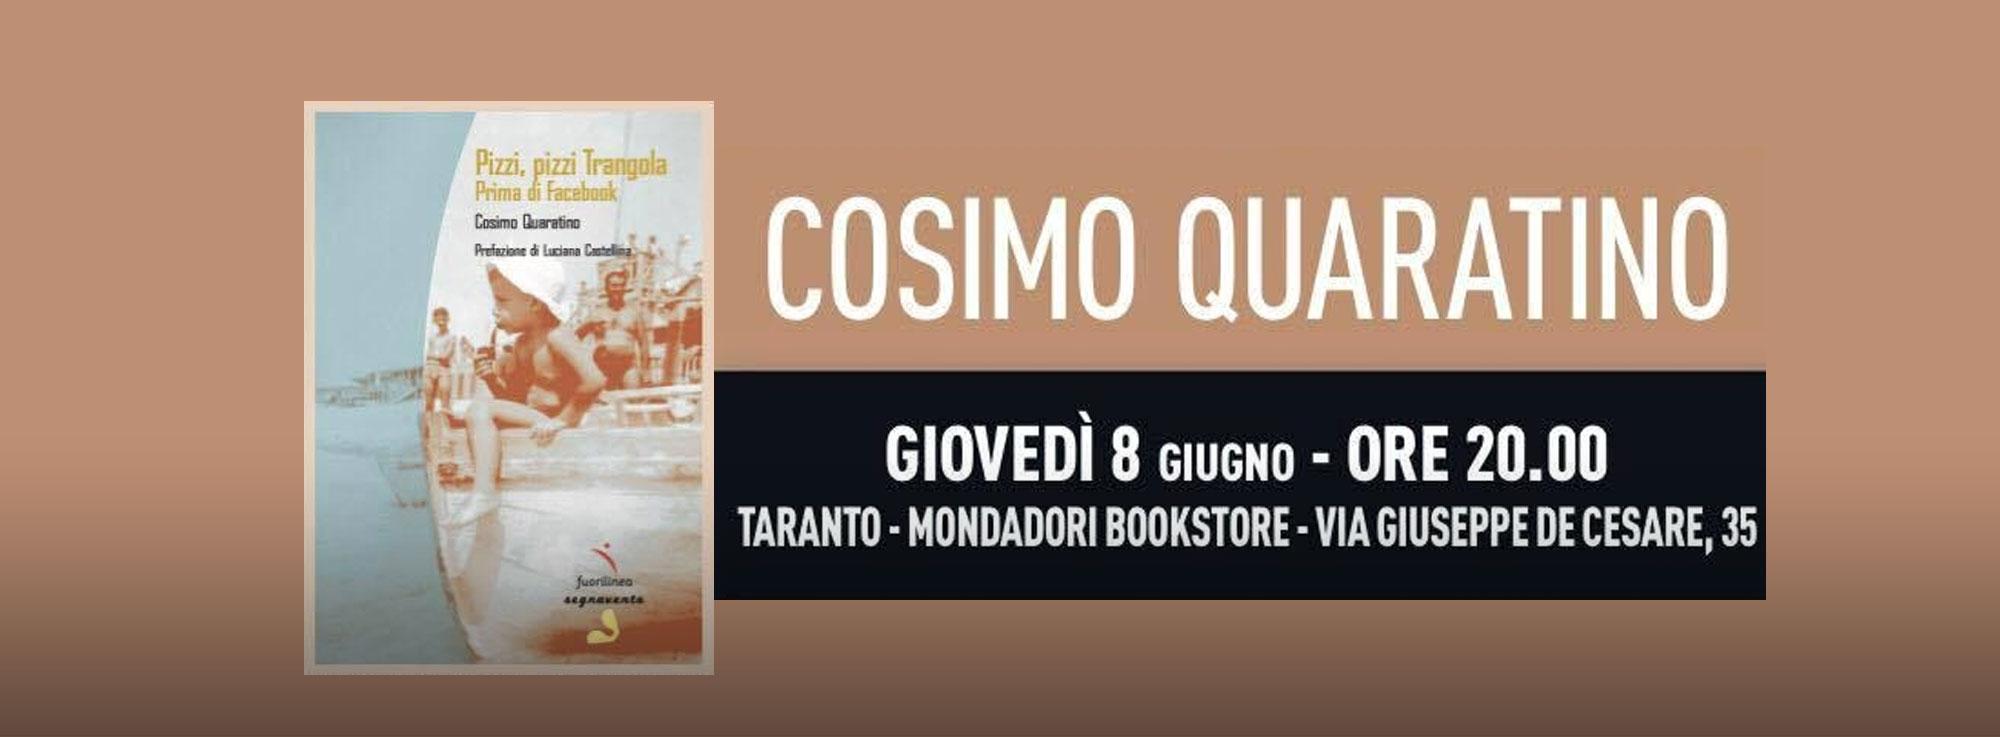 Taranto: Pizzi, pizzi trangola. Prima di Facebook